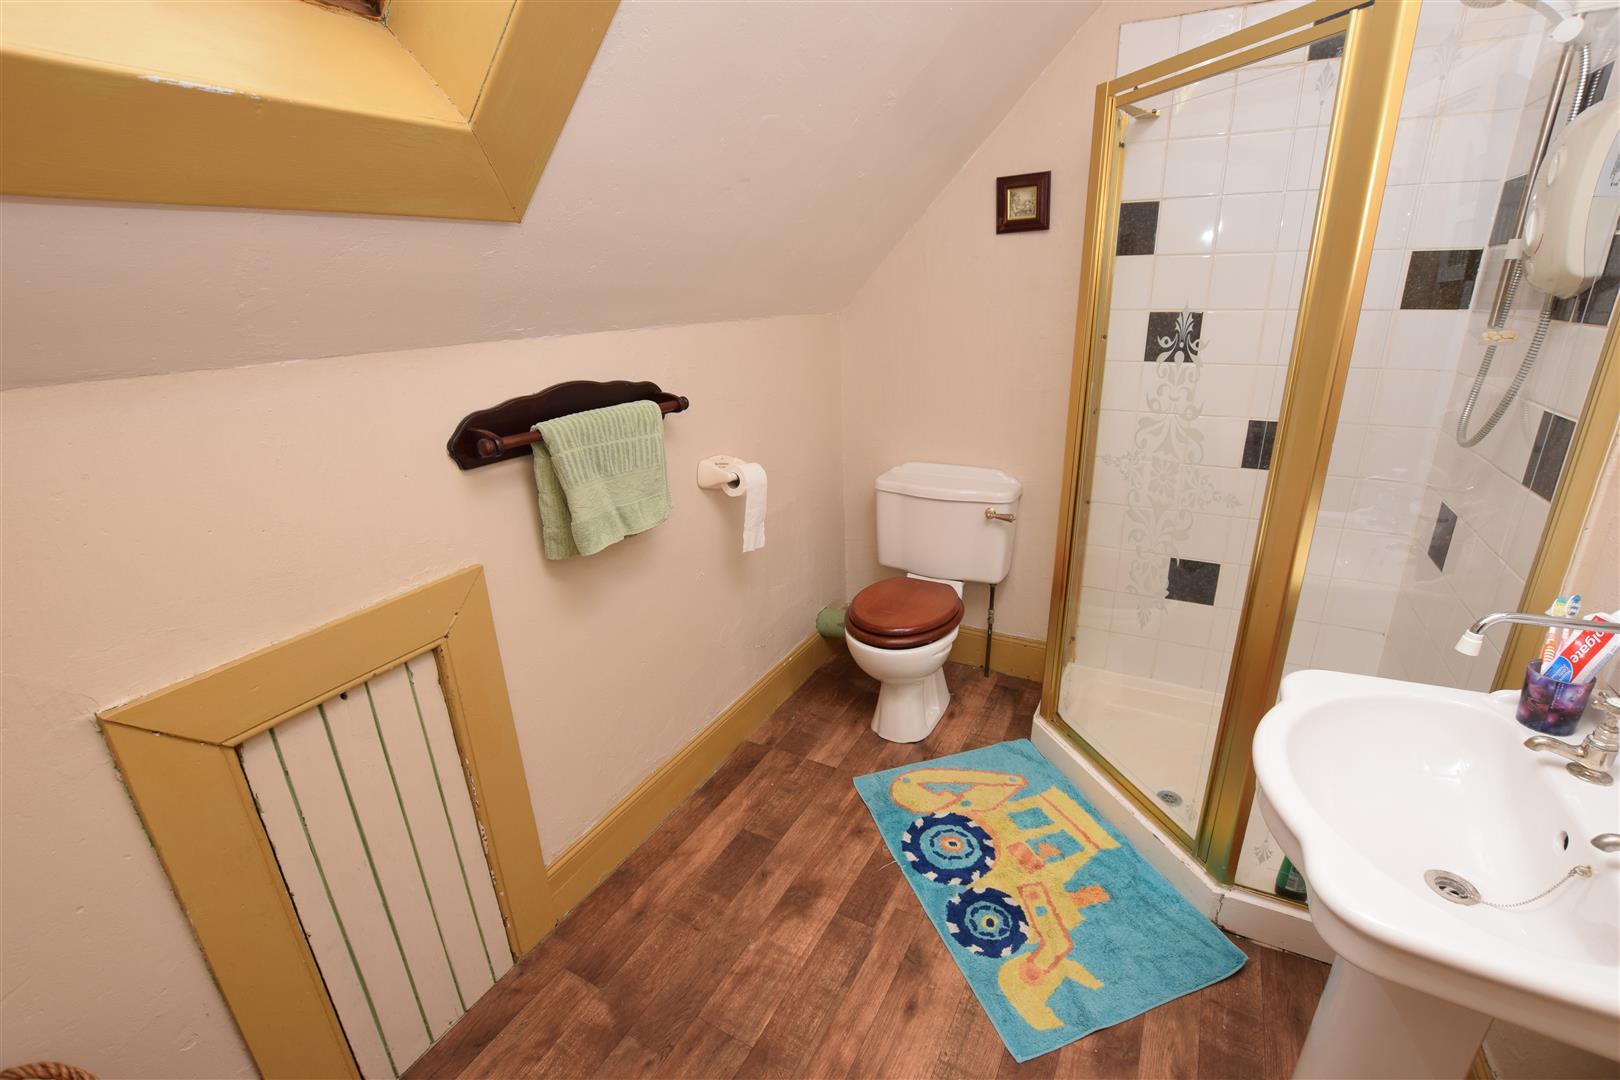 Flat 1, 30, Allan Street, Blairgowrie, Perthshire, PH10 6AD, UK